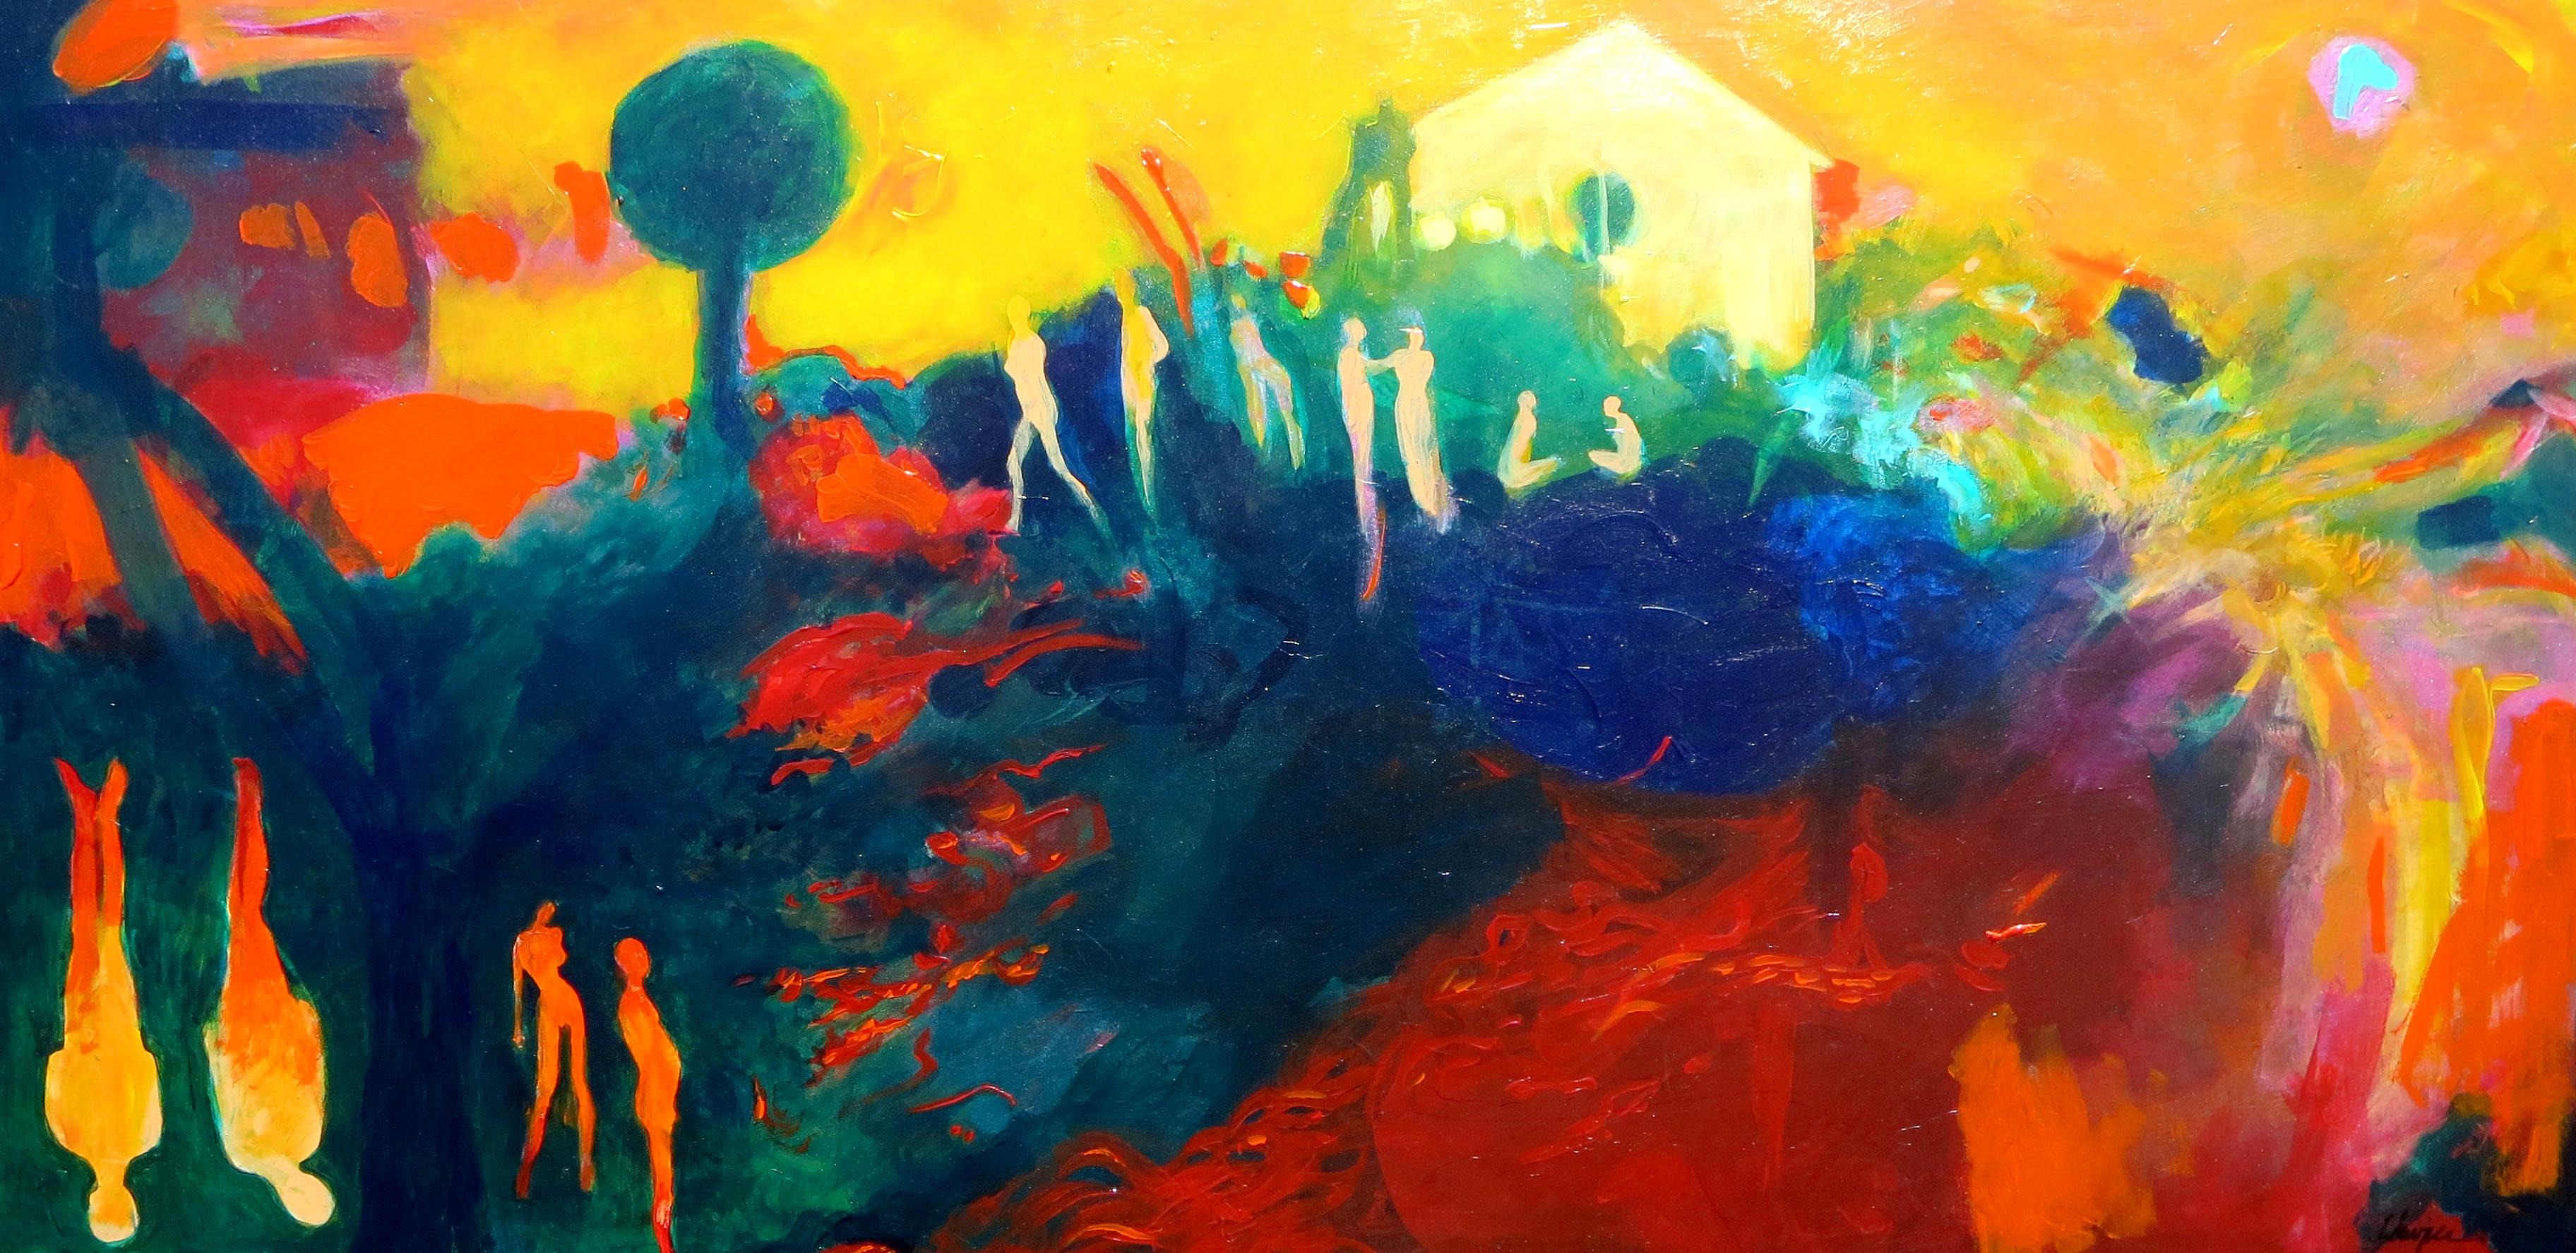 Reunion, acrylic on panel, 24 x 48, 2015